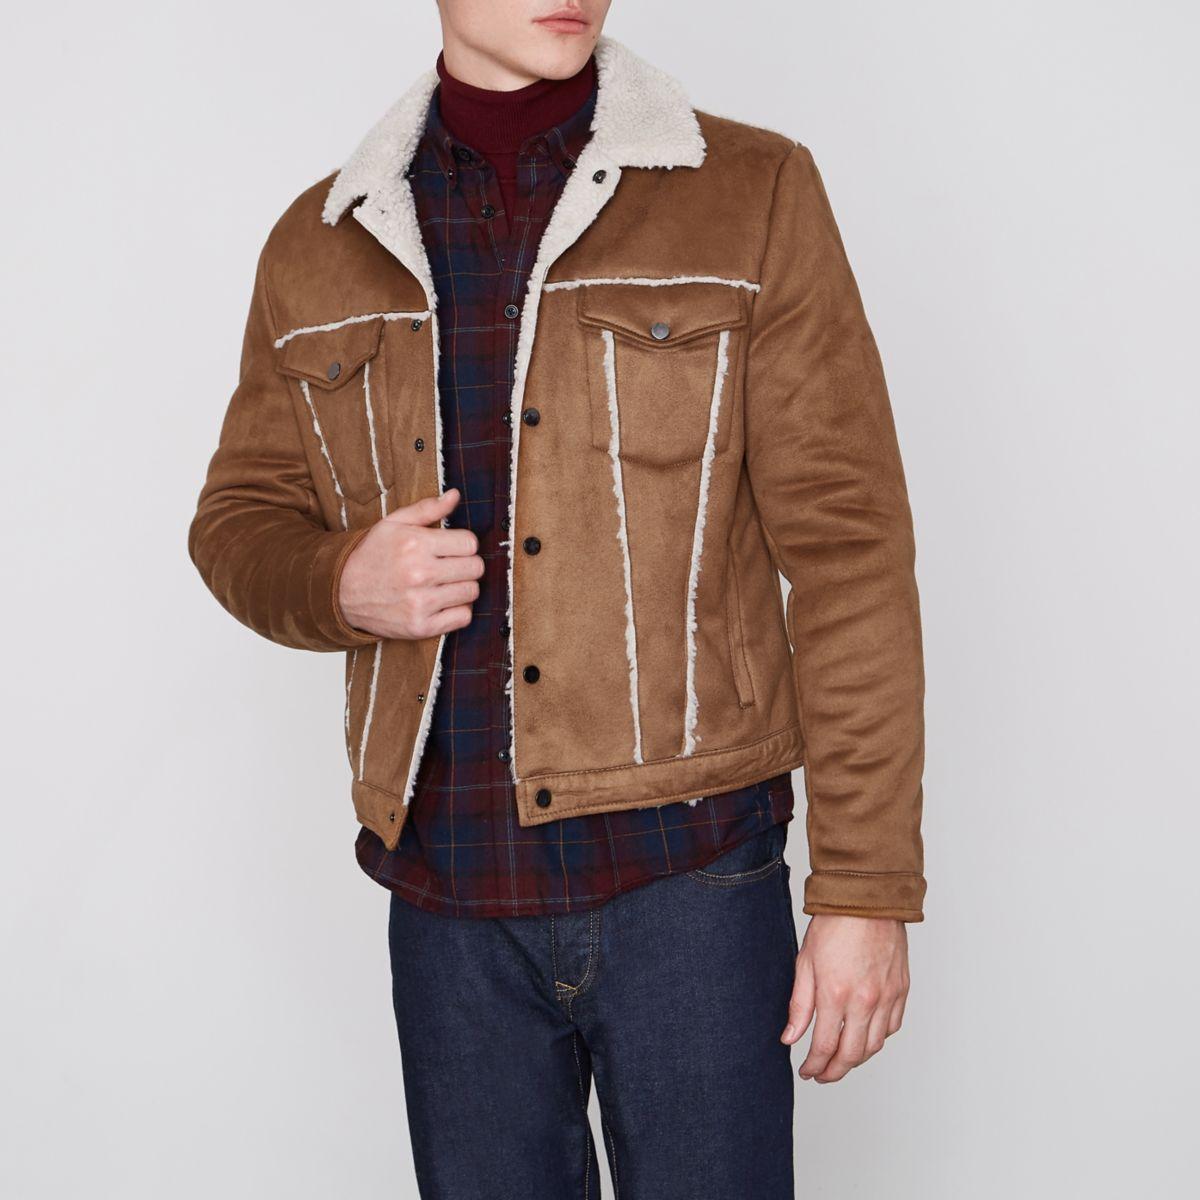 Tan brown borg collar harrington jacket